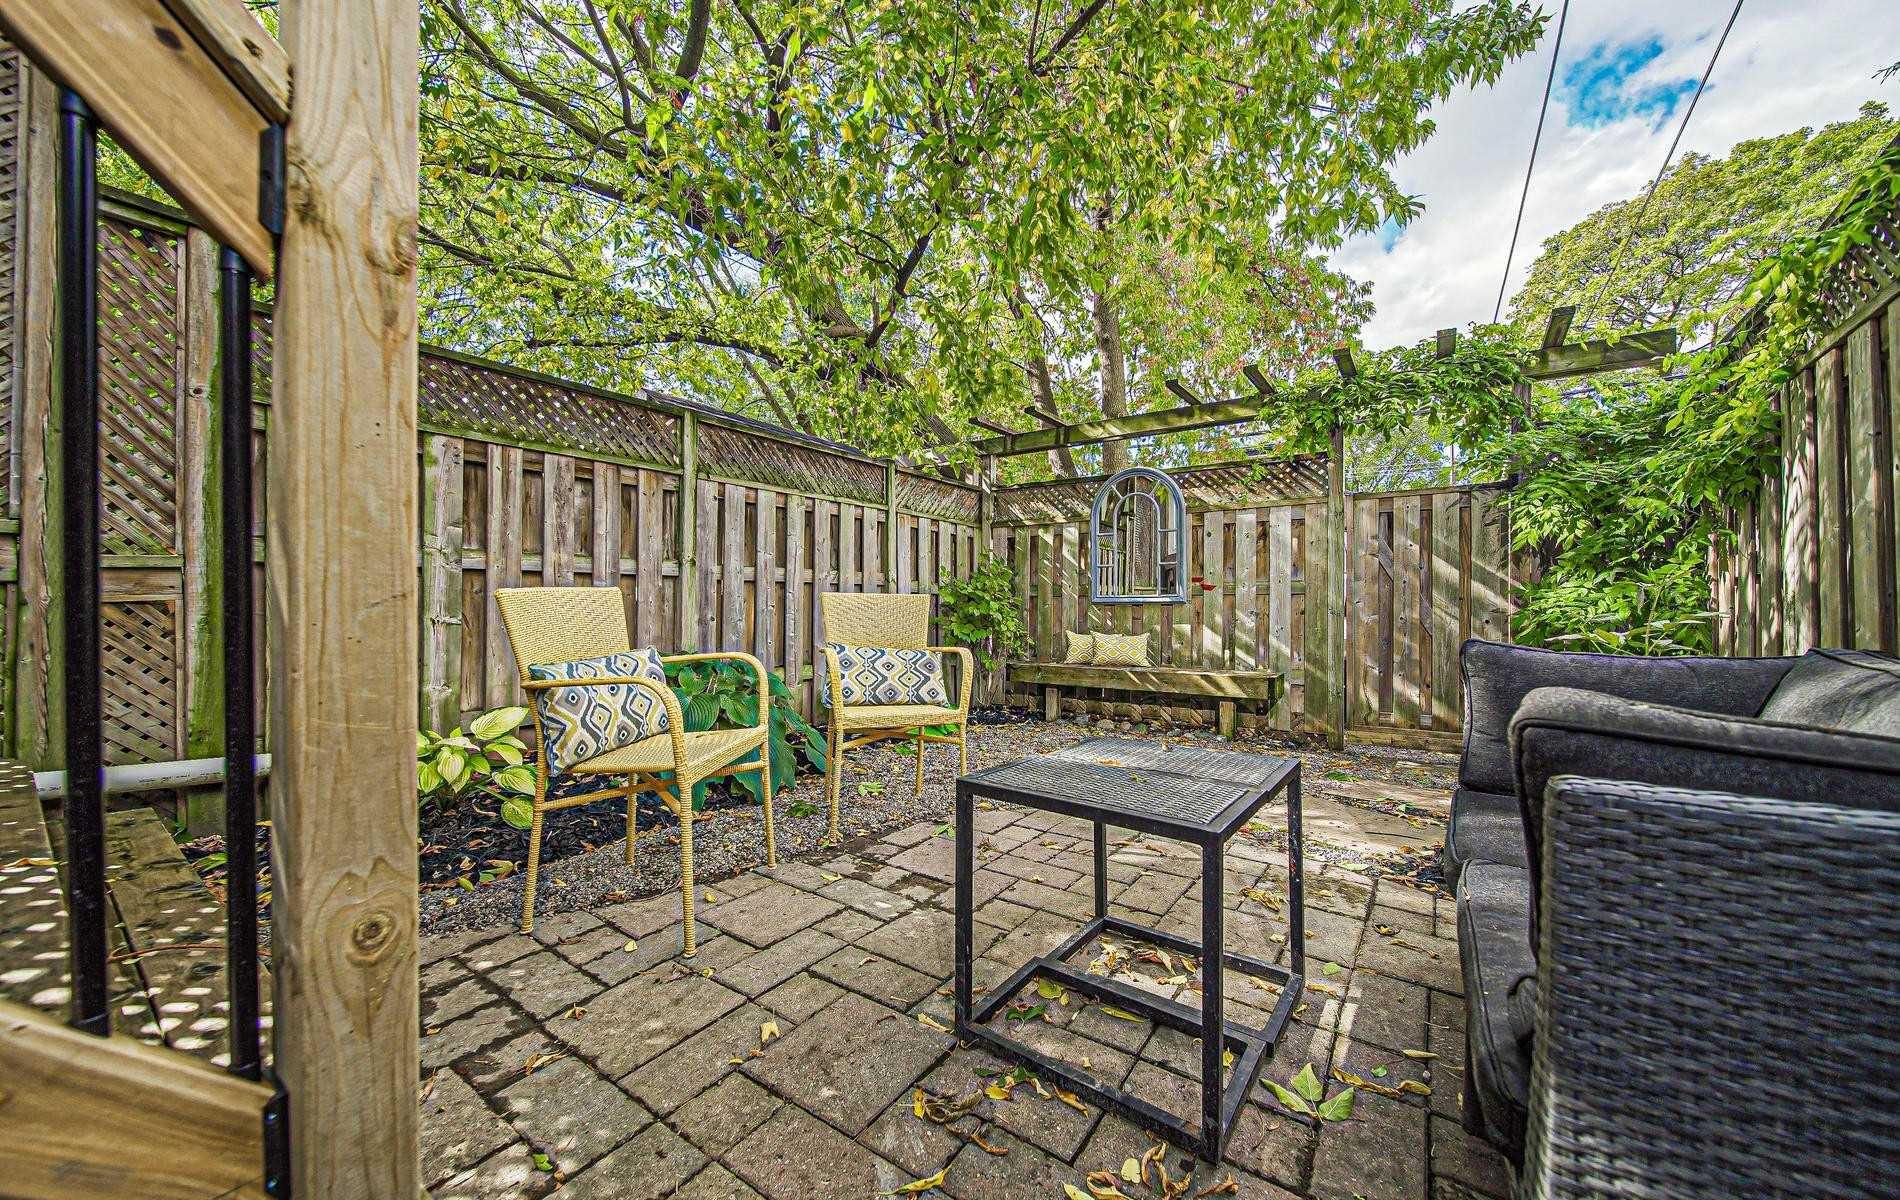 Photo 20: Photos: 84 Rushbrooke Avenue in Toronto: South Riverdale House (2-Storey) for sale (Toronto E01)  : MLS®# E4600791